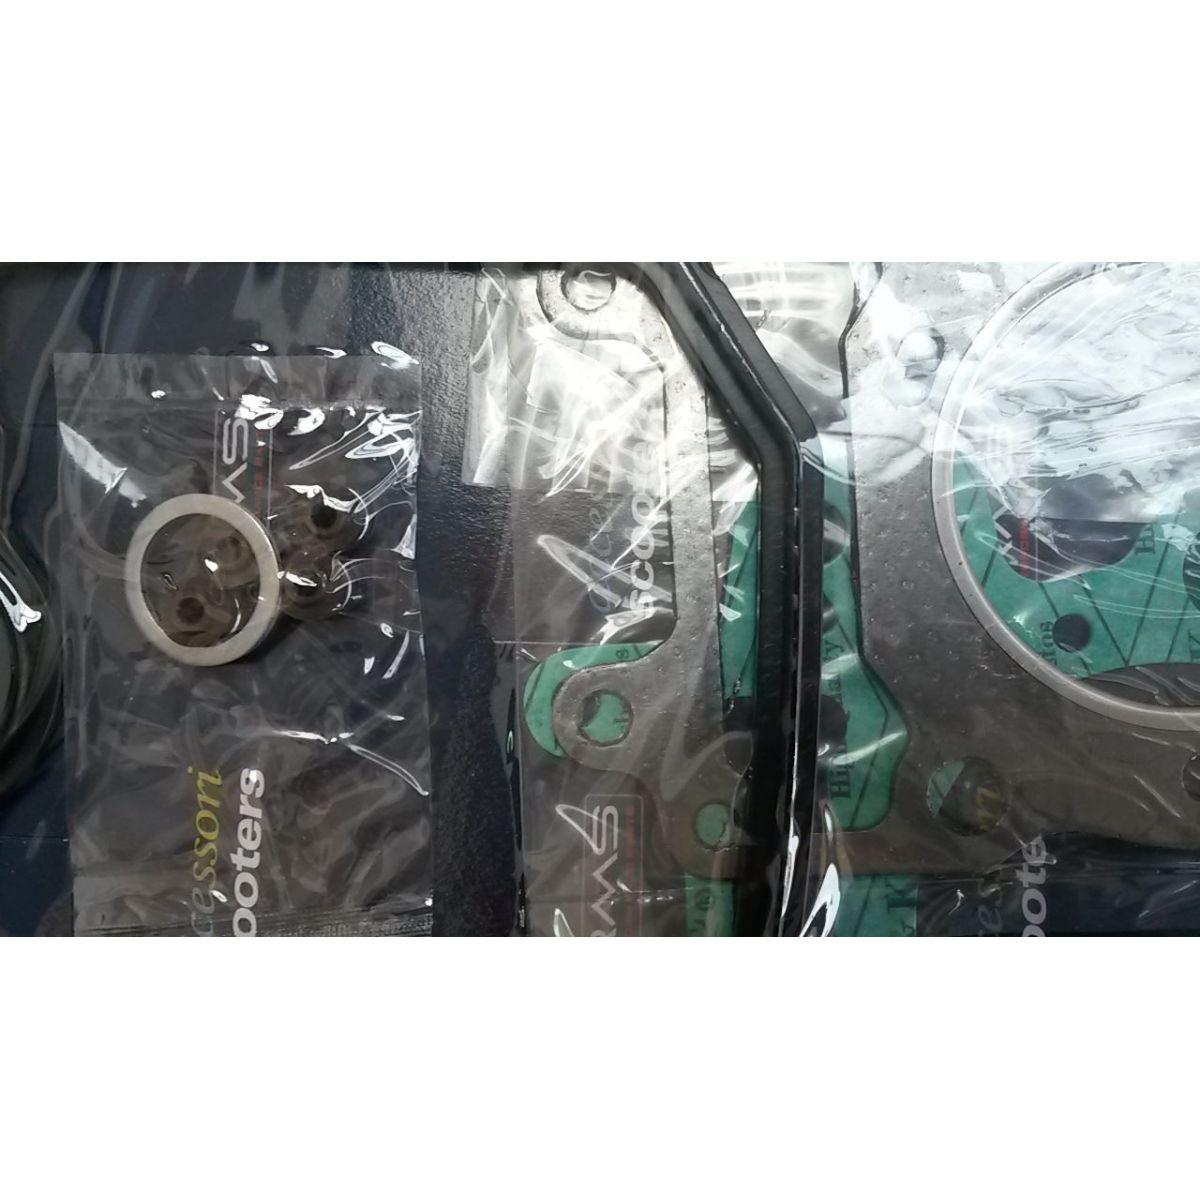 Serie guarnizione per Scarabeo 125 150 200